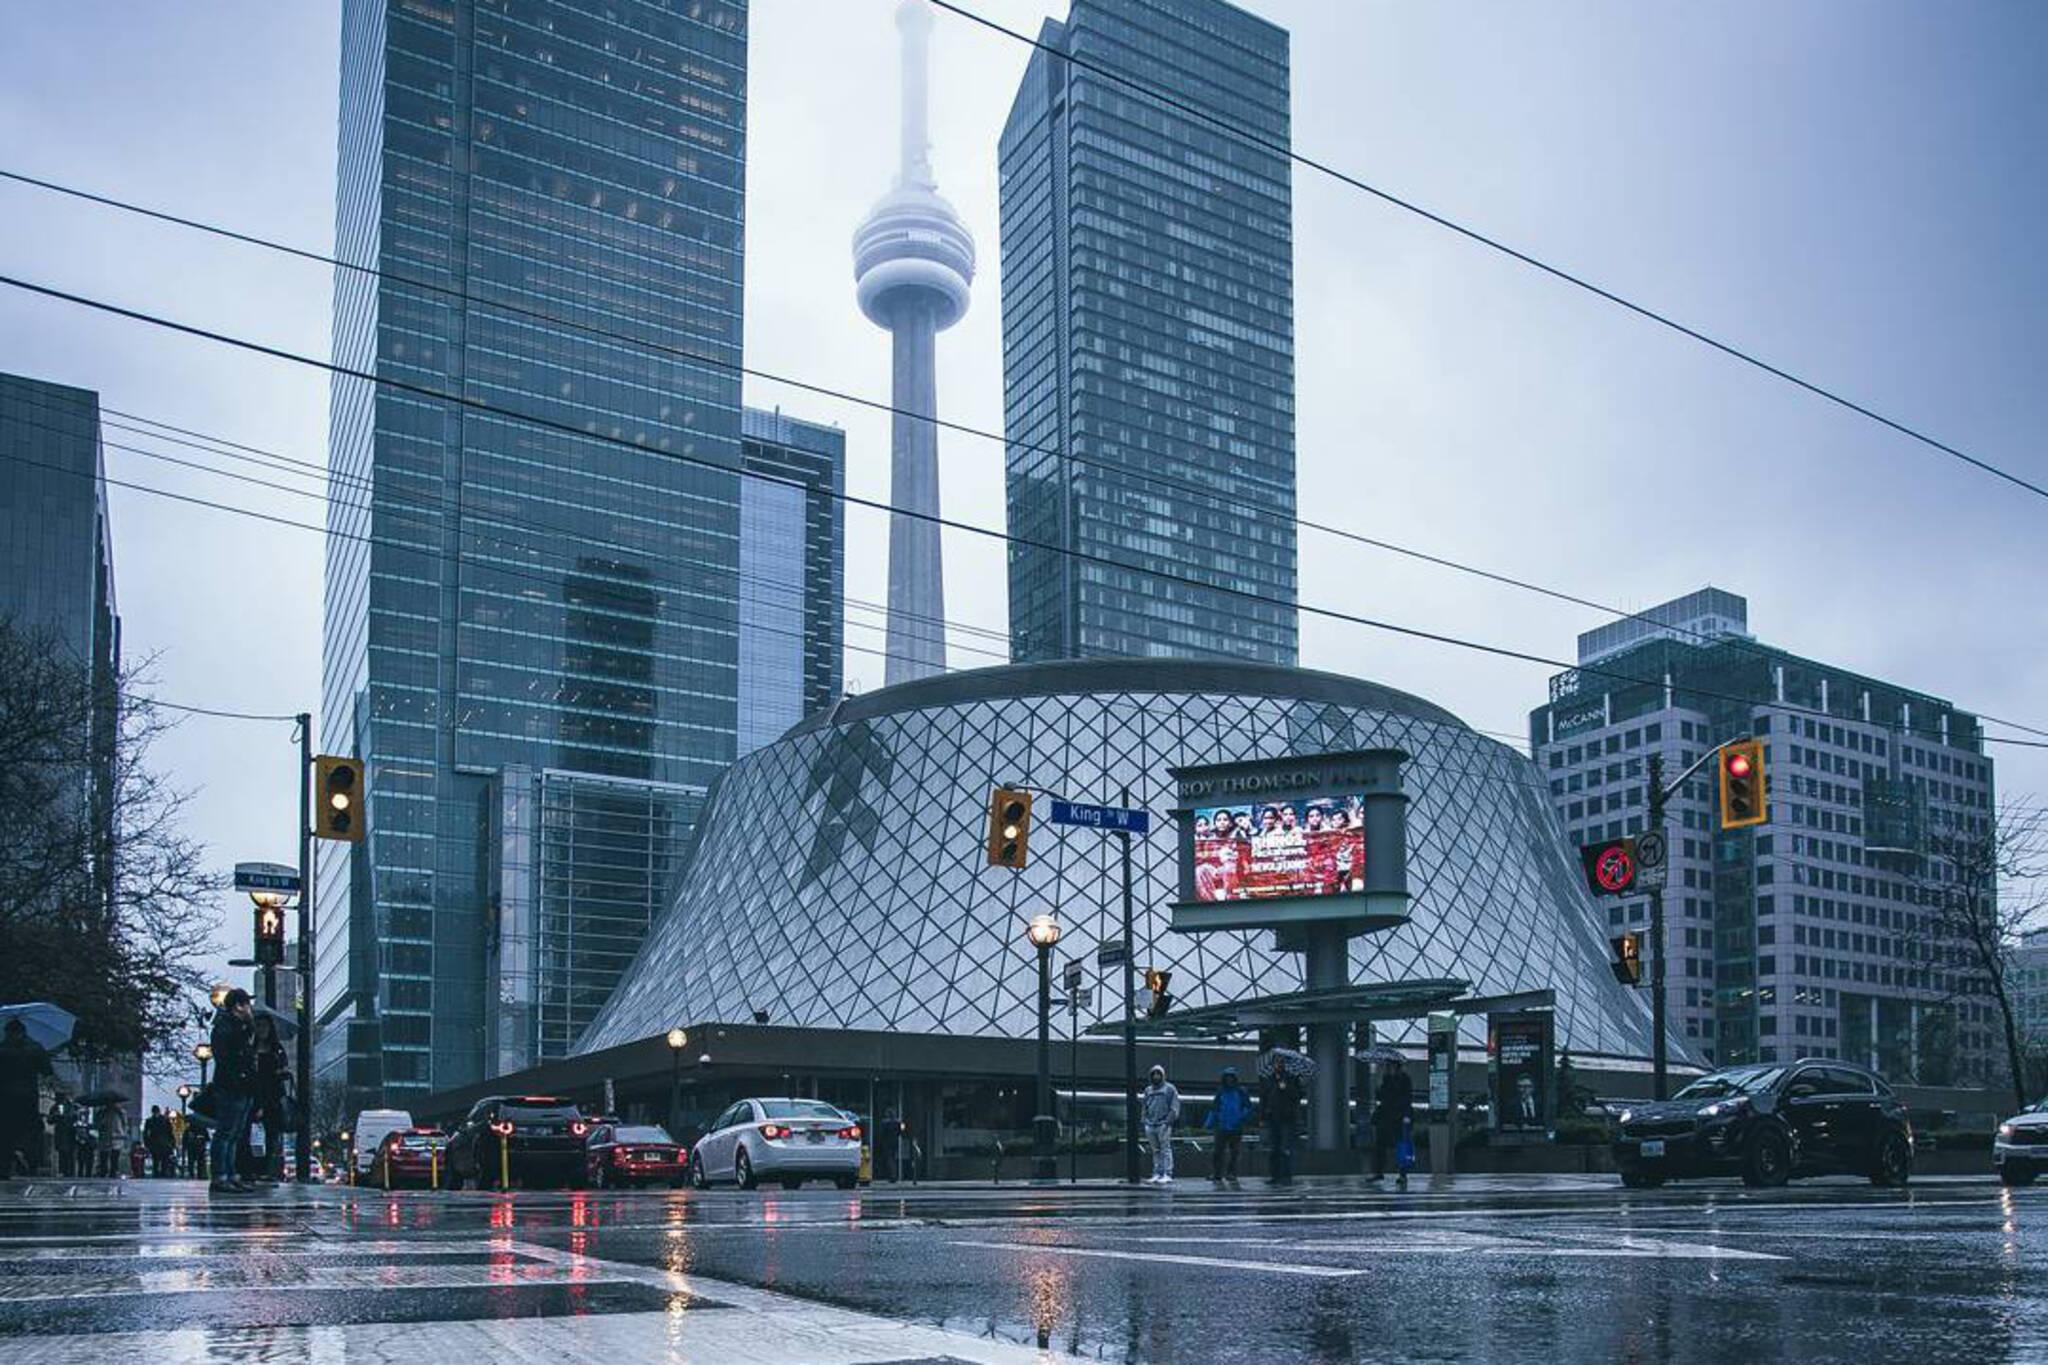 Wacky Toronto weather